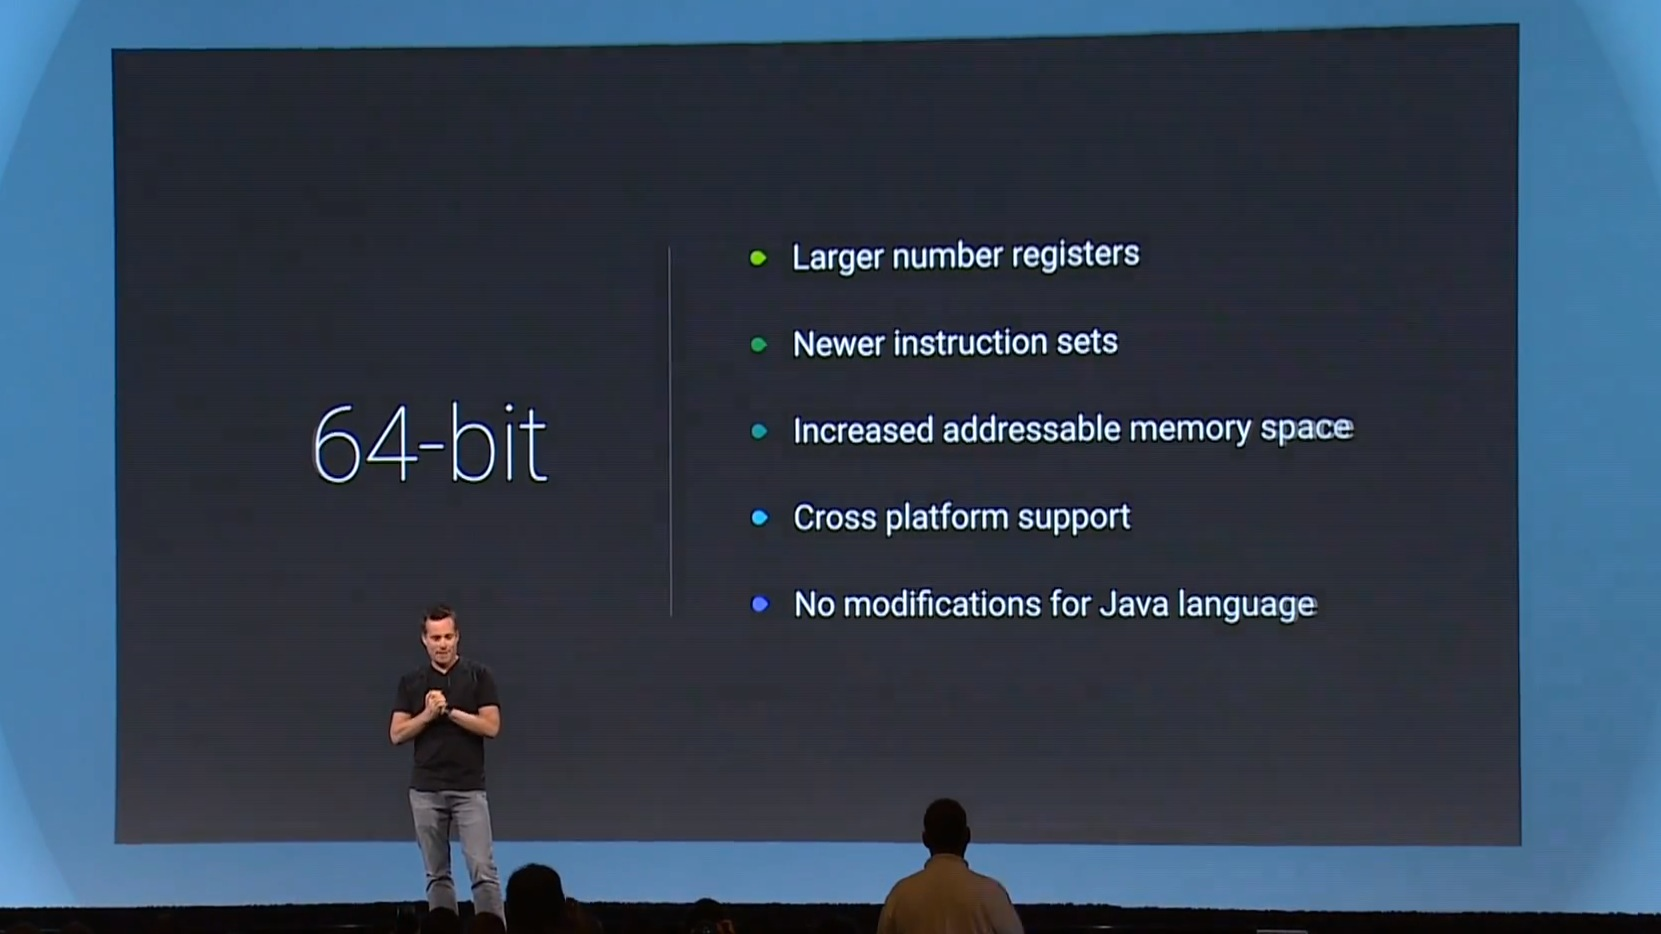 android-leentjebuur2014-64bits